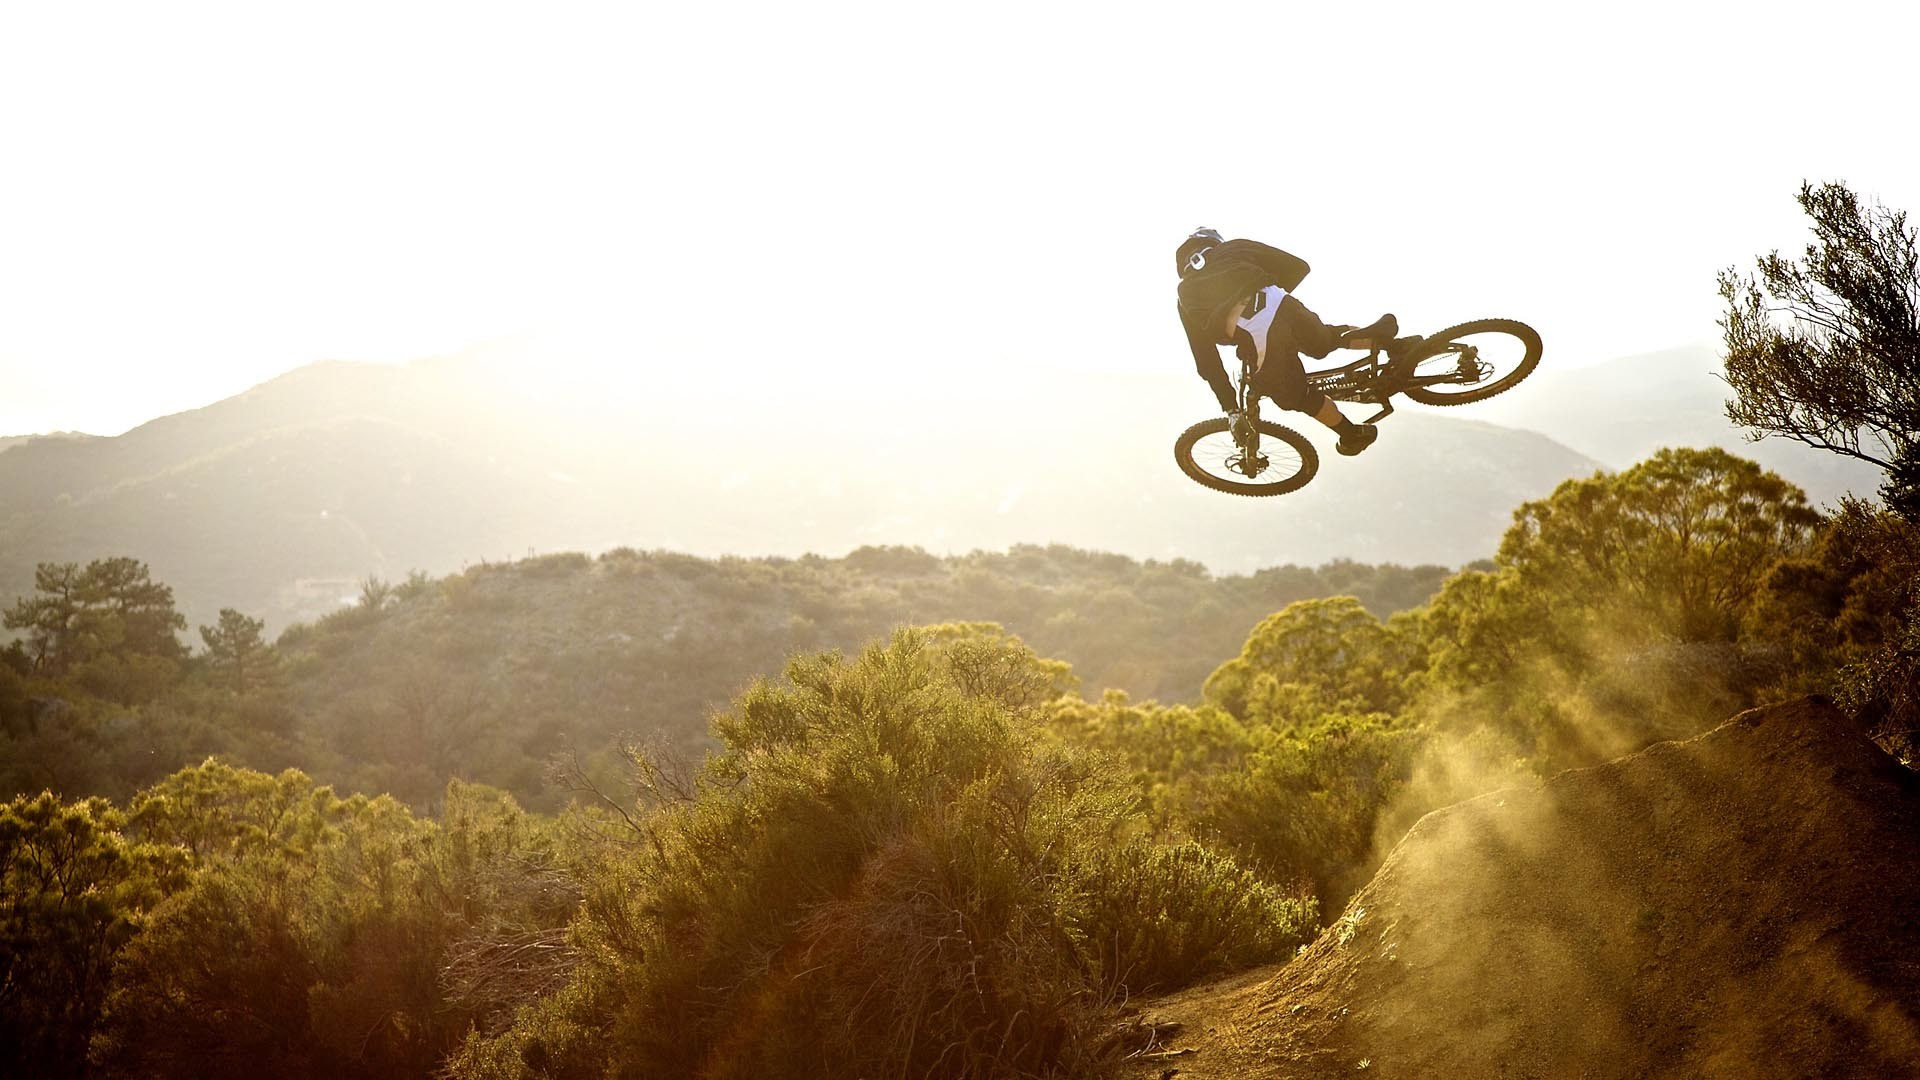 Extreme Mountain Biking Wallpaper: Mountain Bike Wallpaper HD (68+ Images